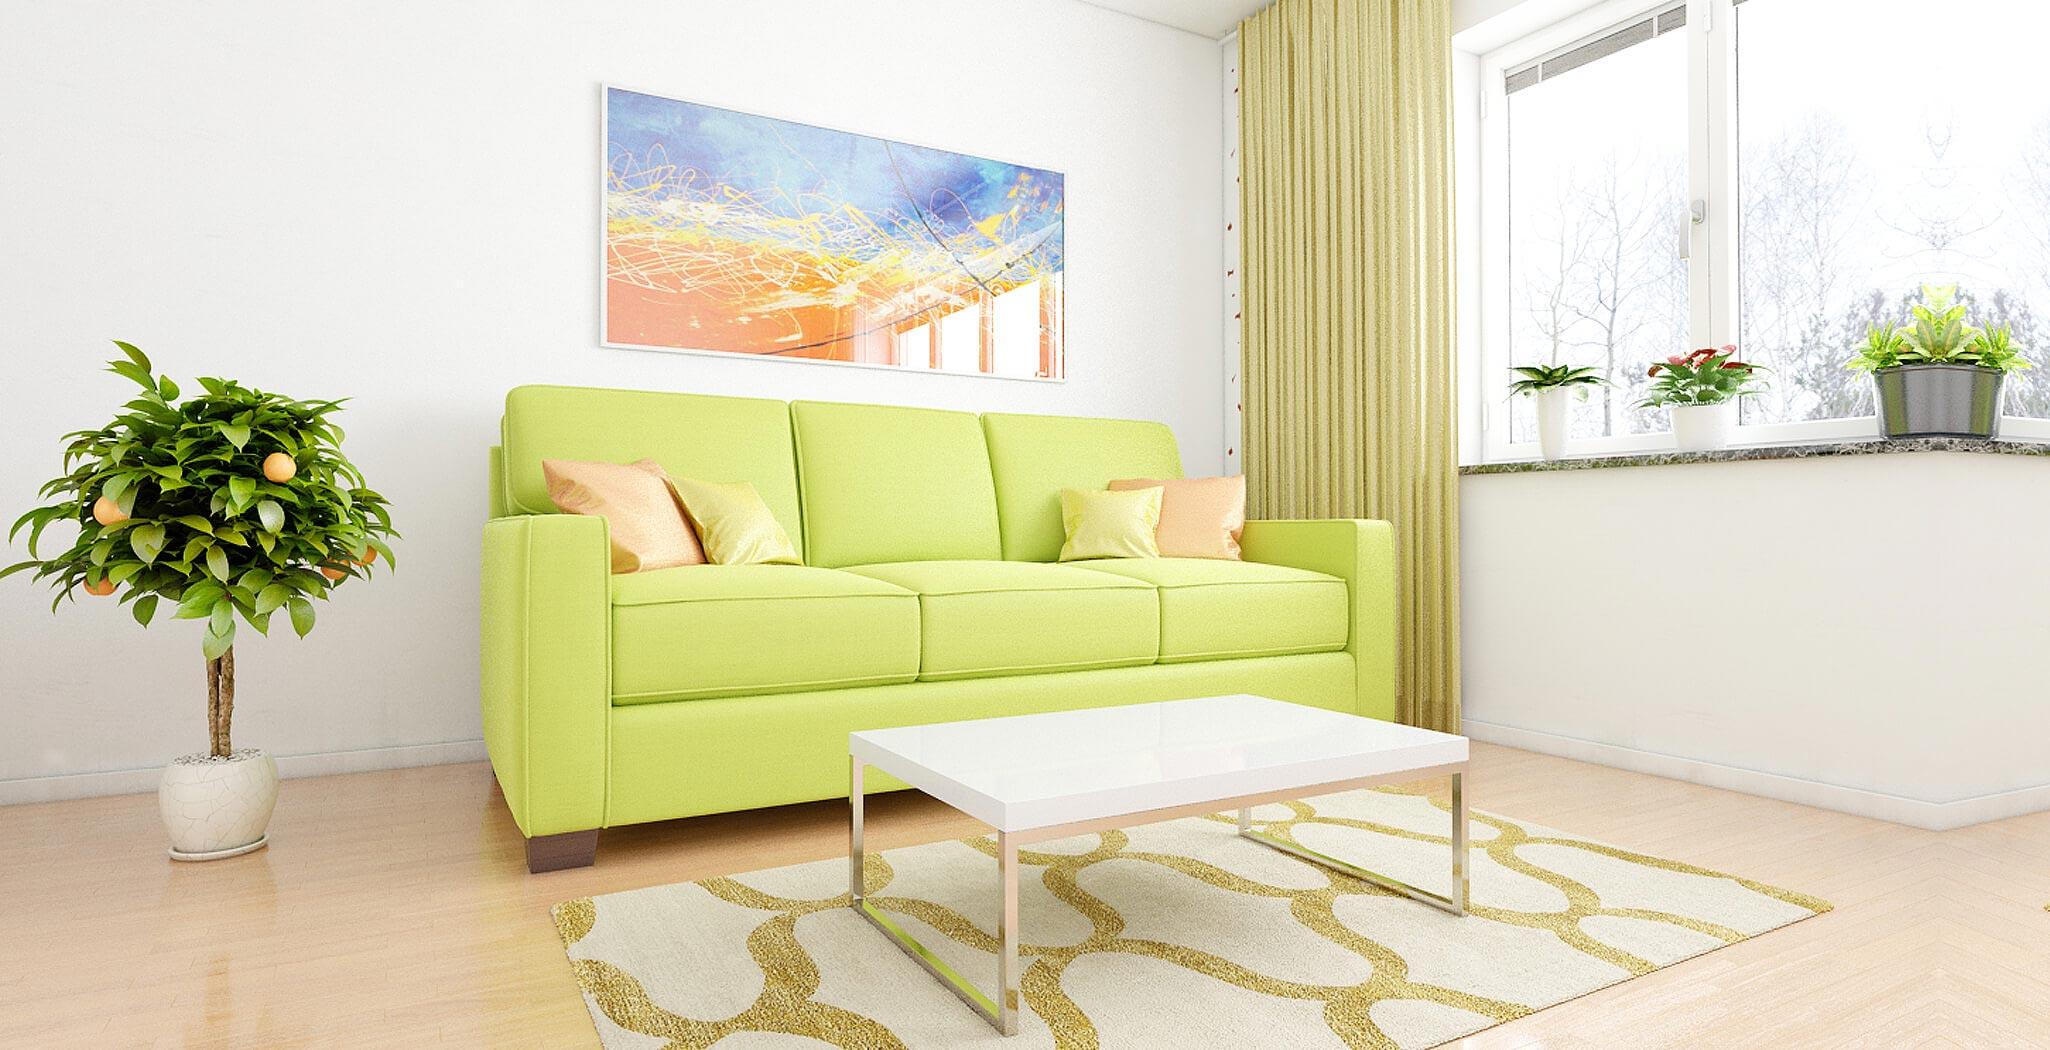 chicago sofa furniture gallery 3